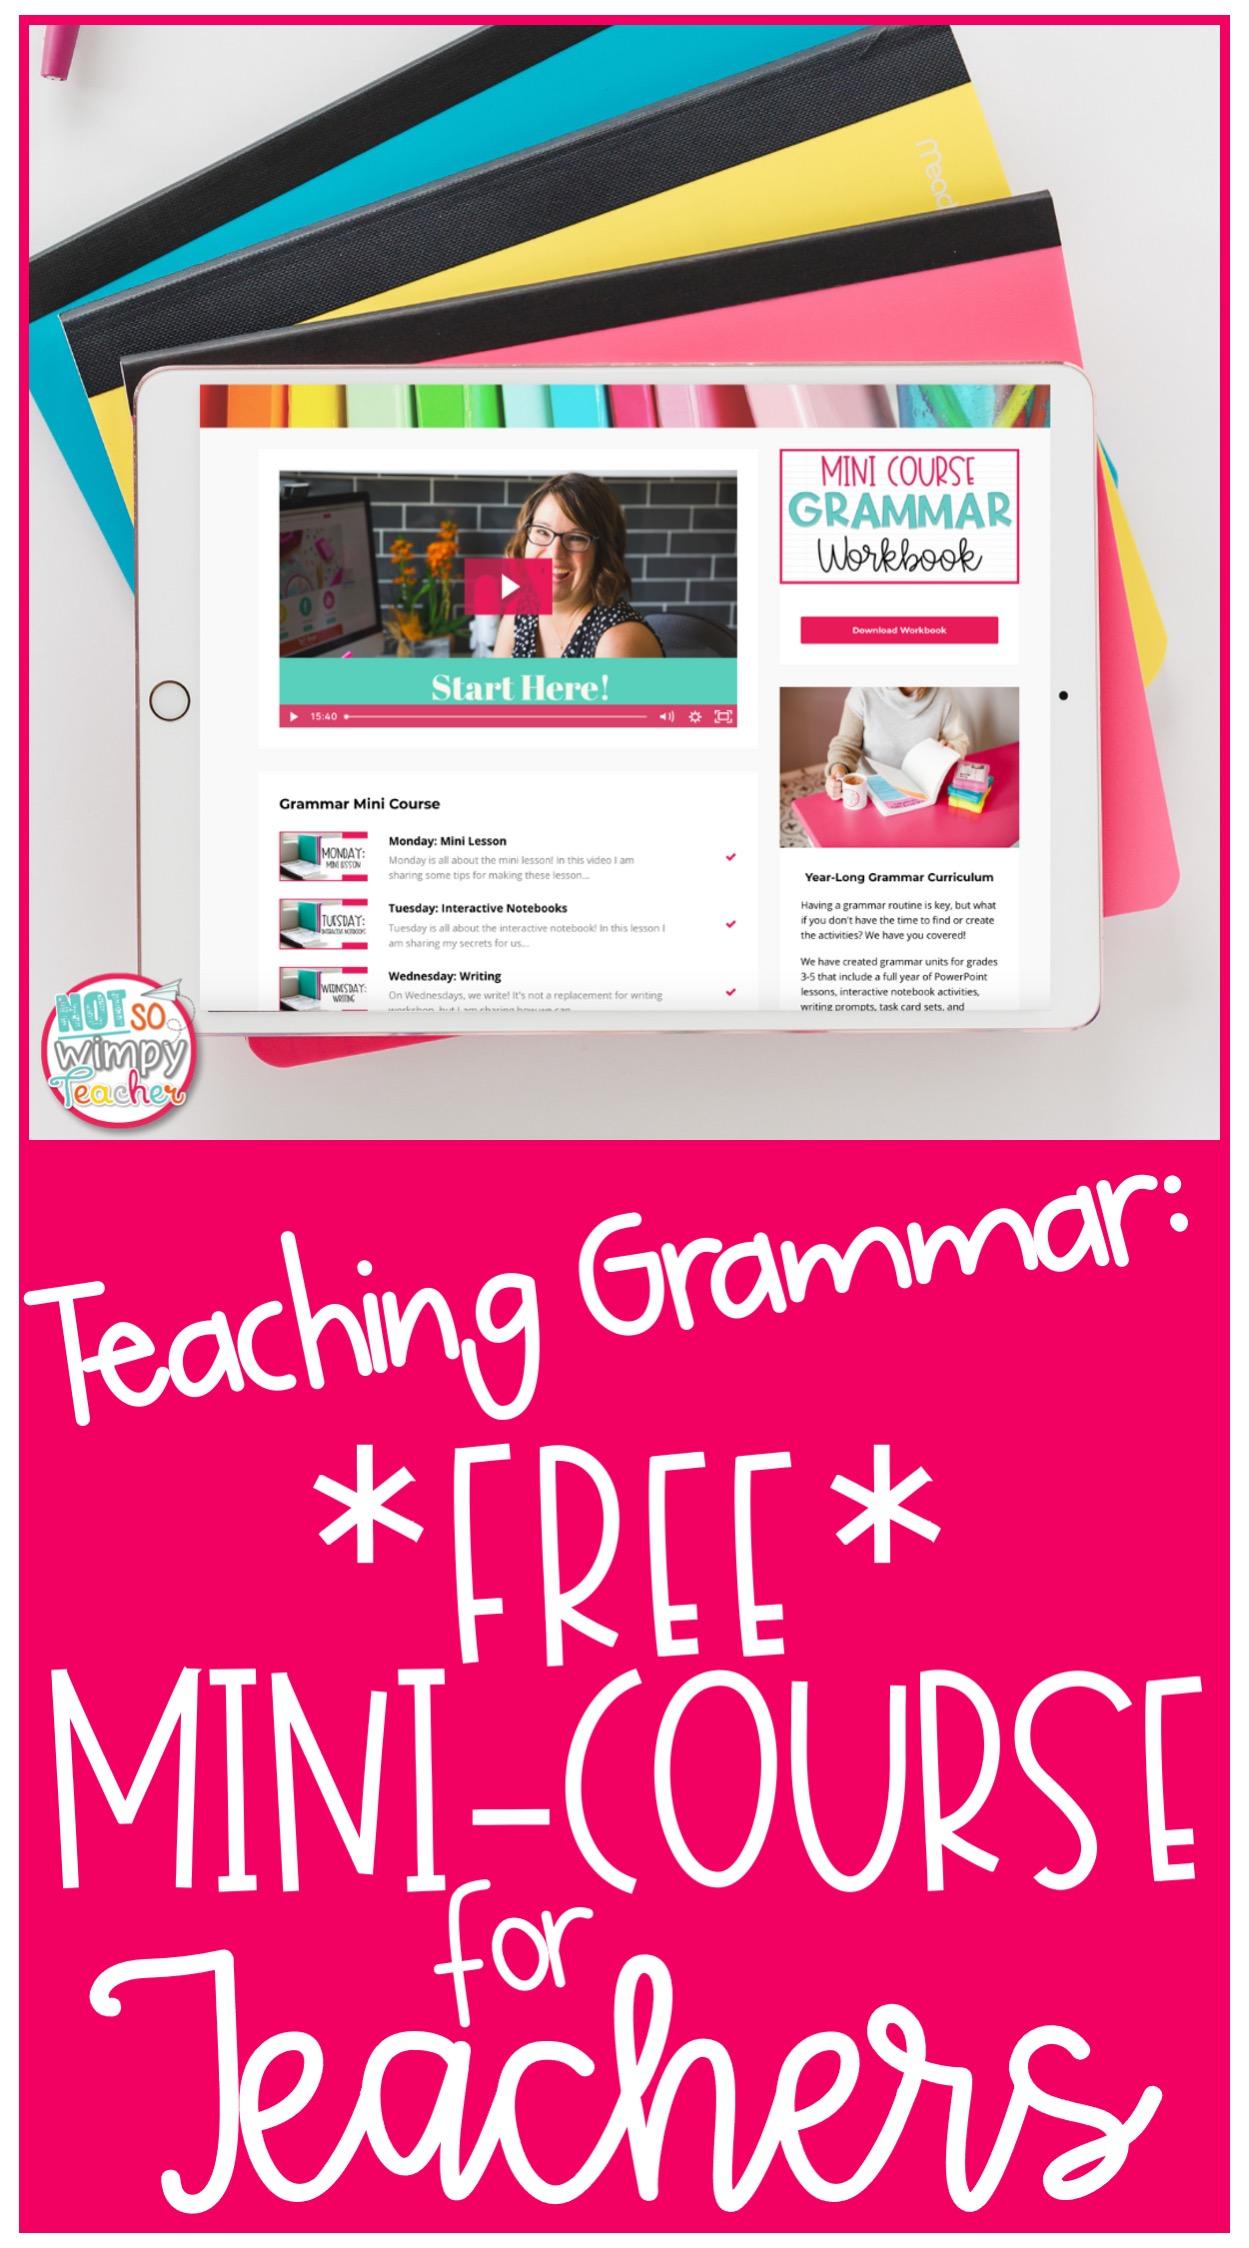 ipad displaying free teaching grammar mini-course for elementary school teachers